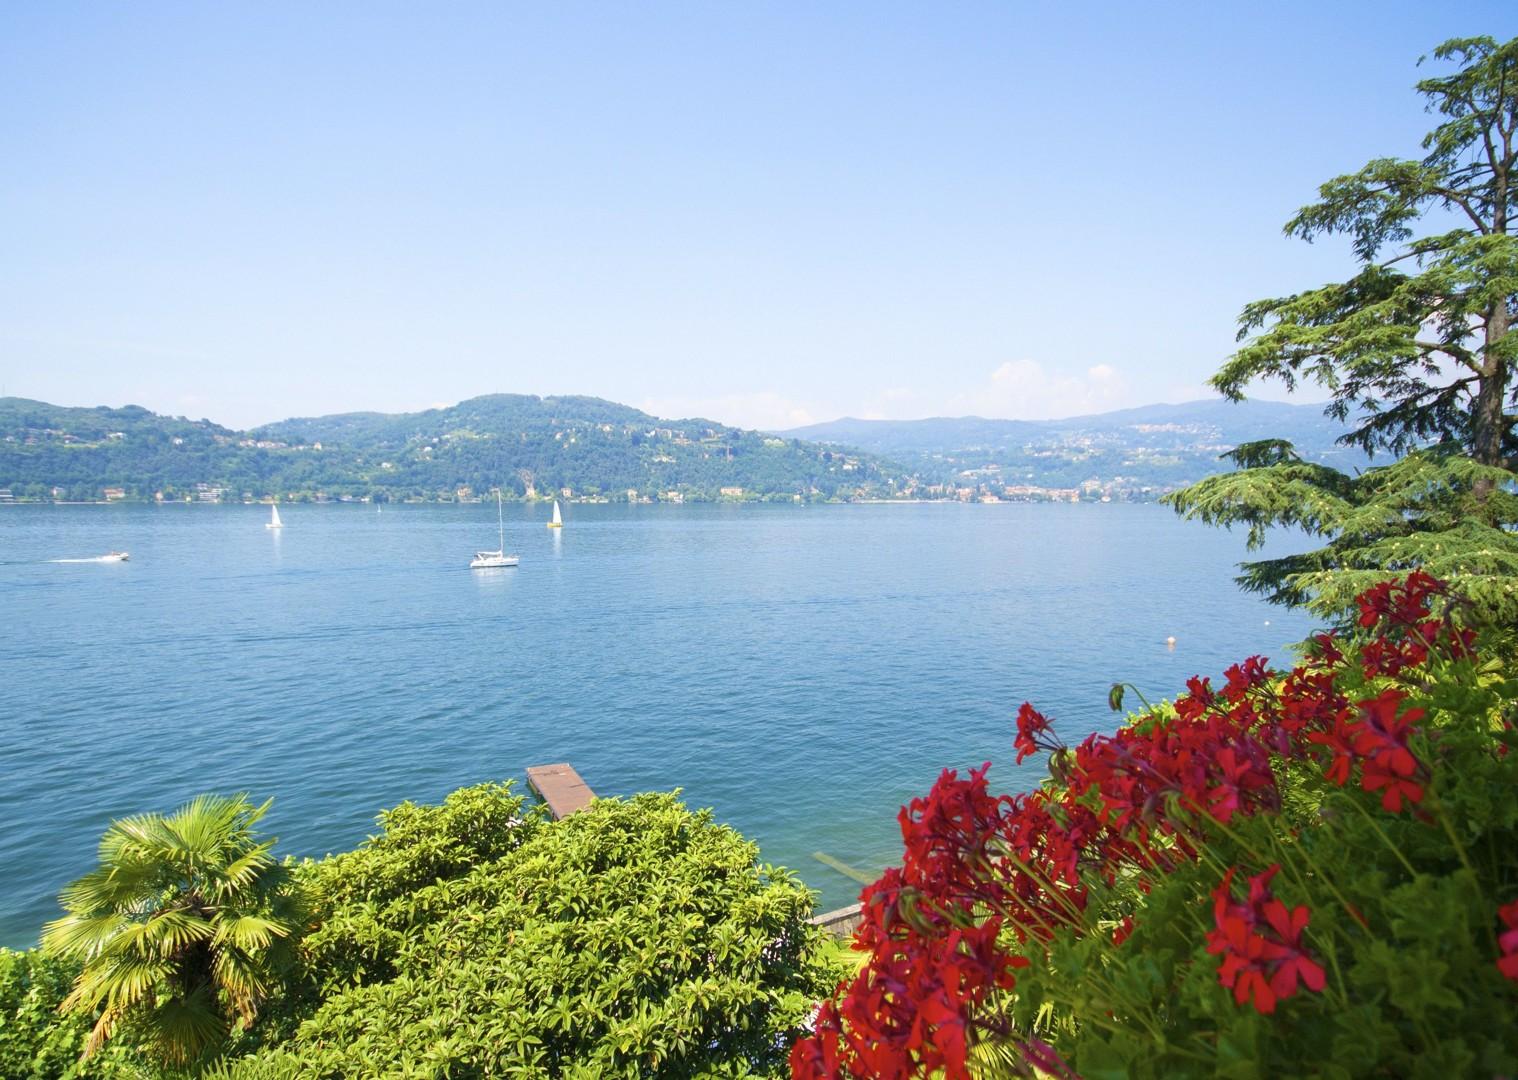 lombardia9.jpg - Italy - Lakes of Lombardia - Guided Road Cycling Holiday - Road Cycling